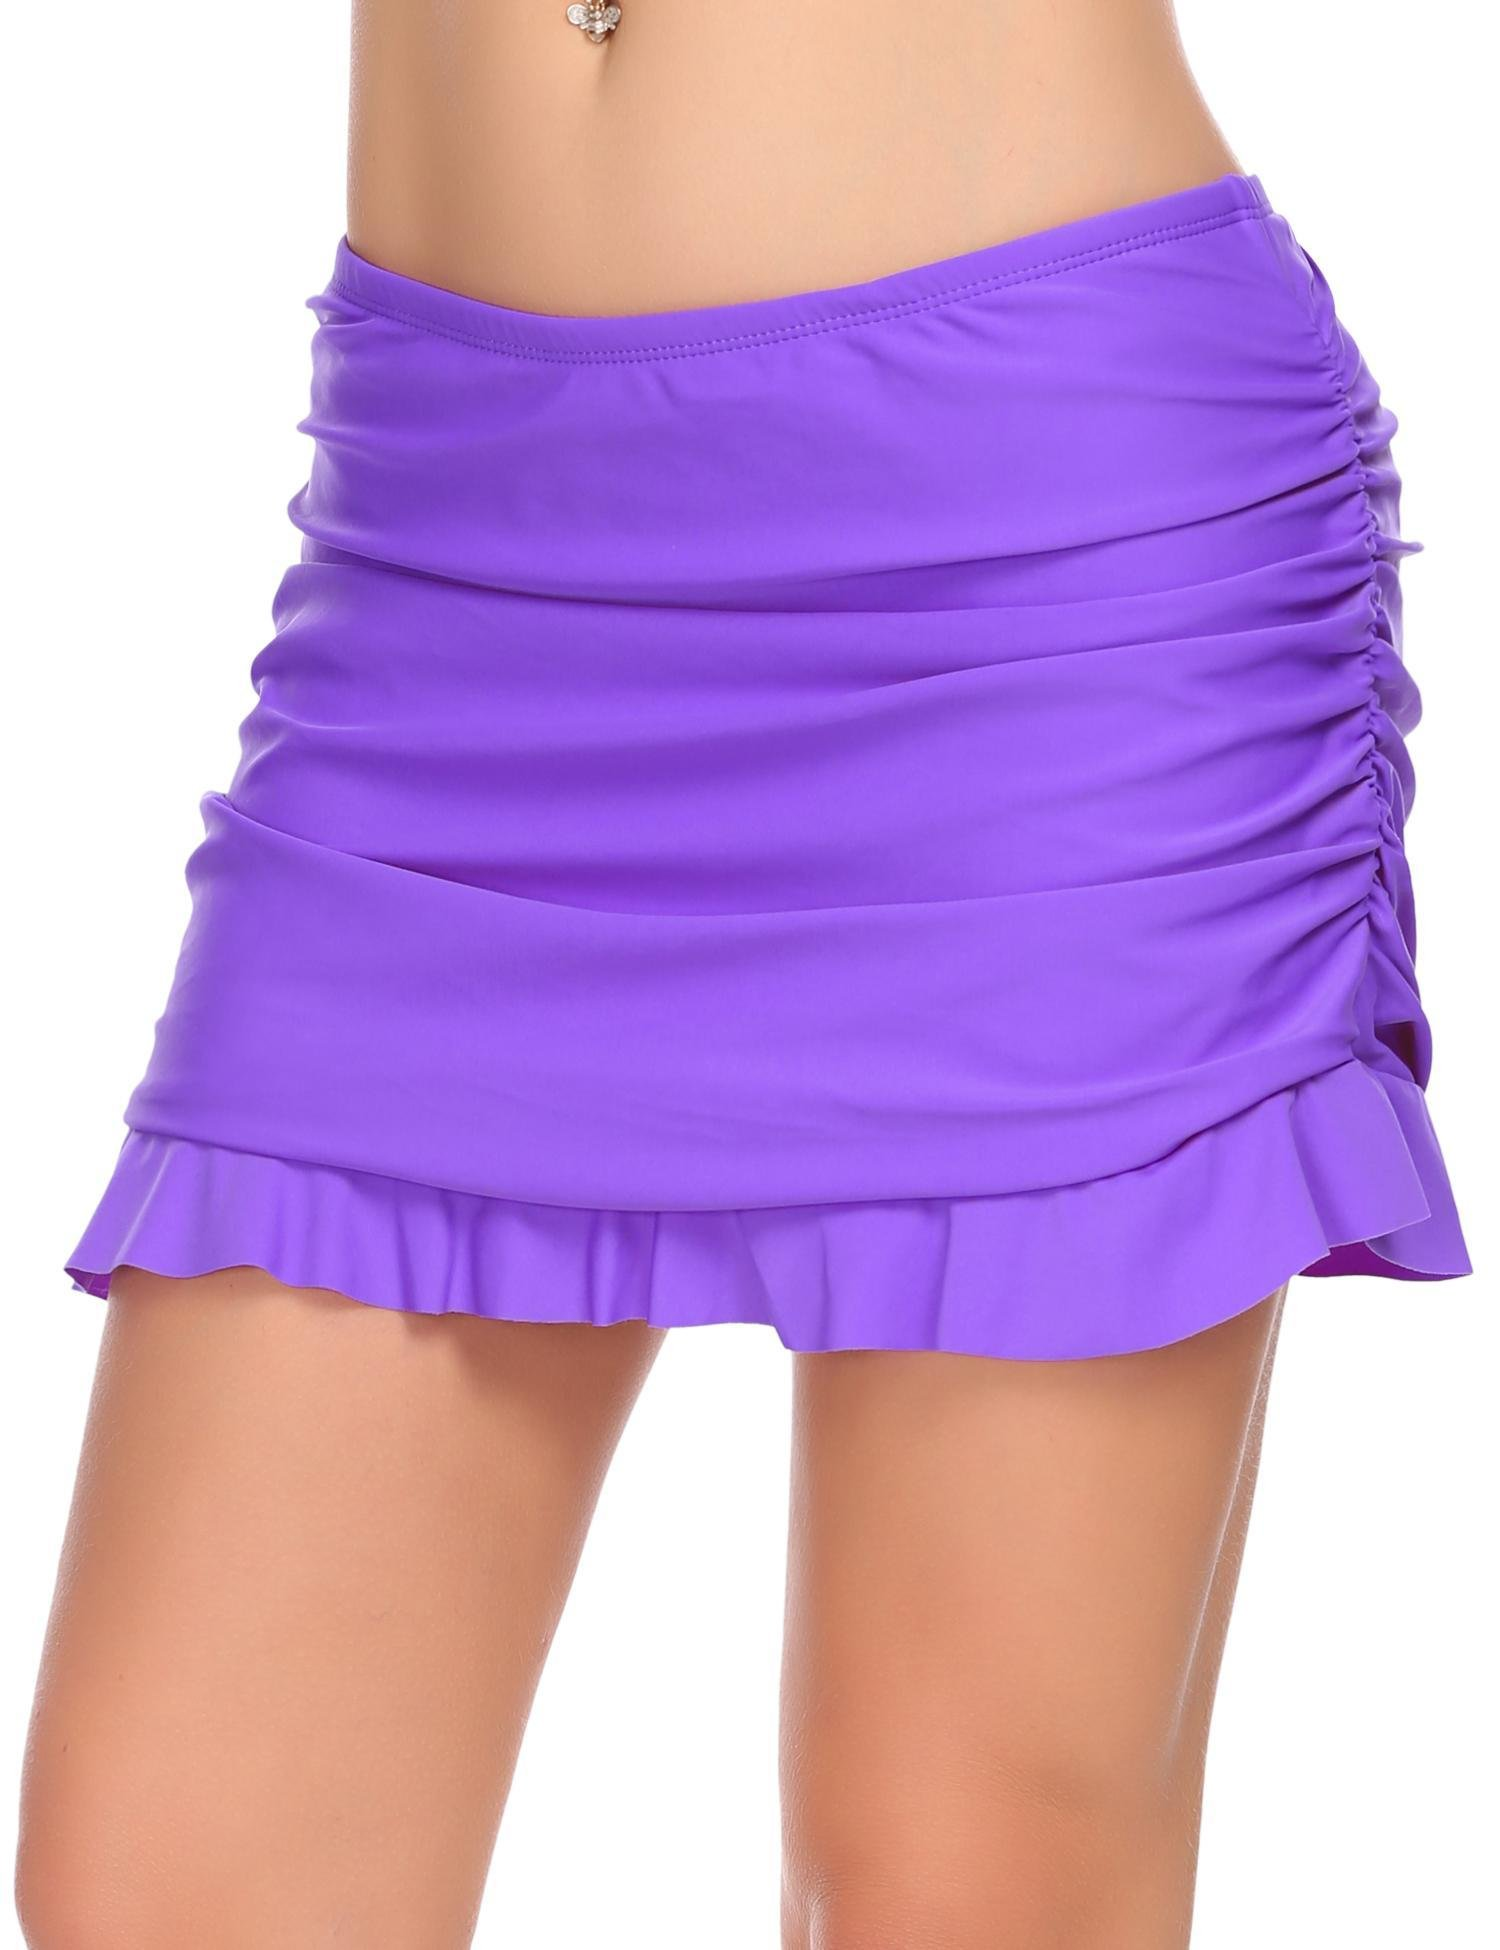 Ekouaer Skirted Bikini Bottom Womens Ruffled Bikini Skirt with Panty Swimwear (Black, Small)